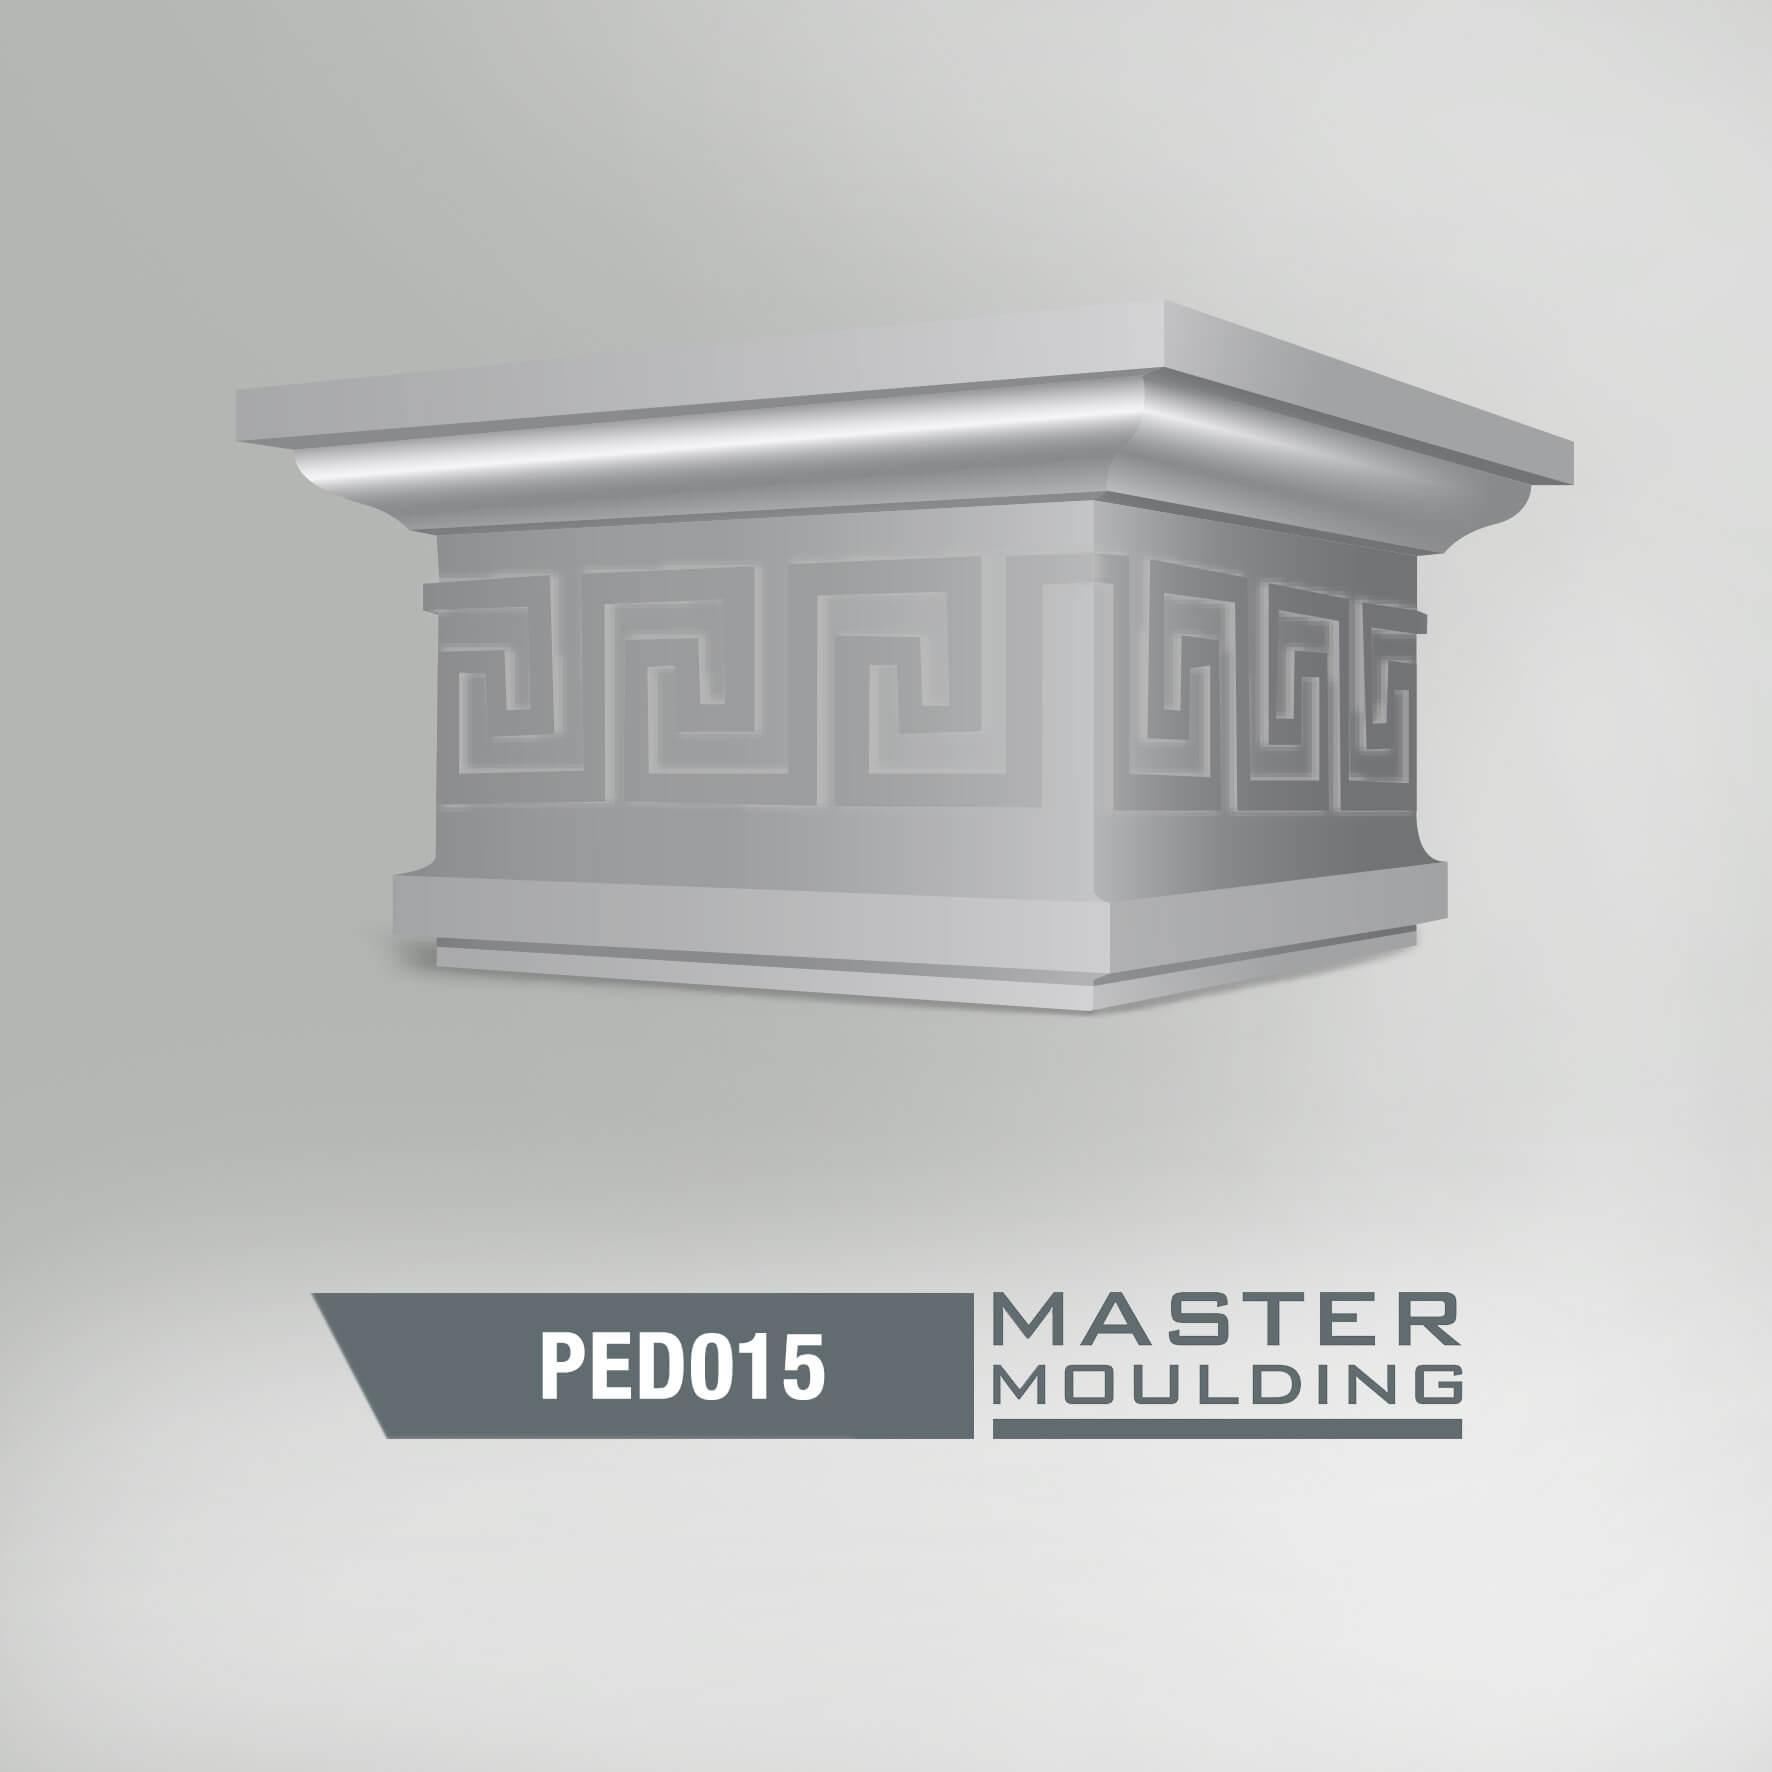 PED015